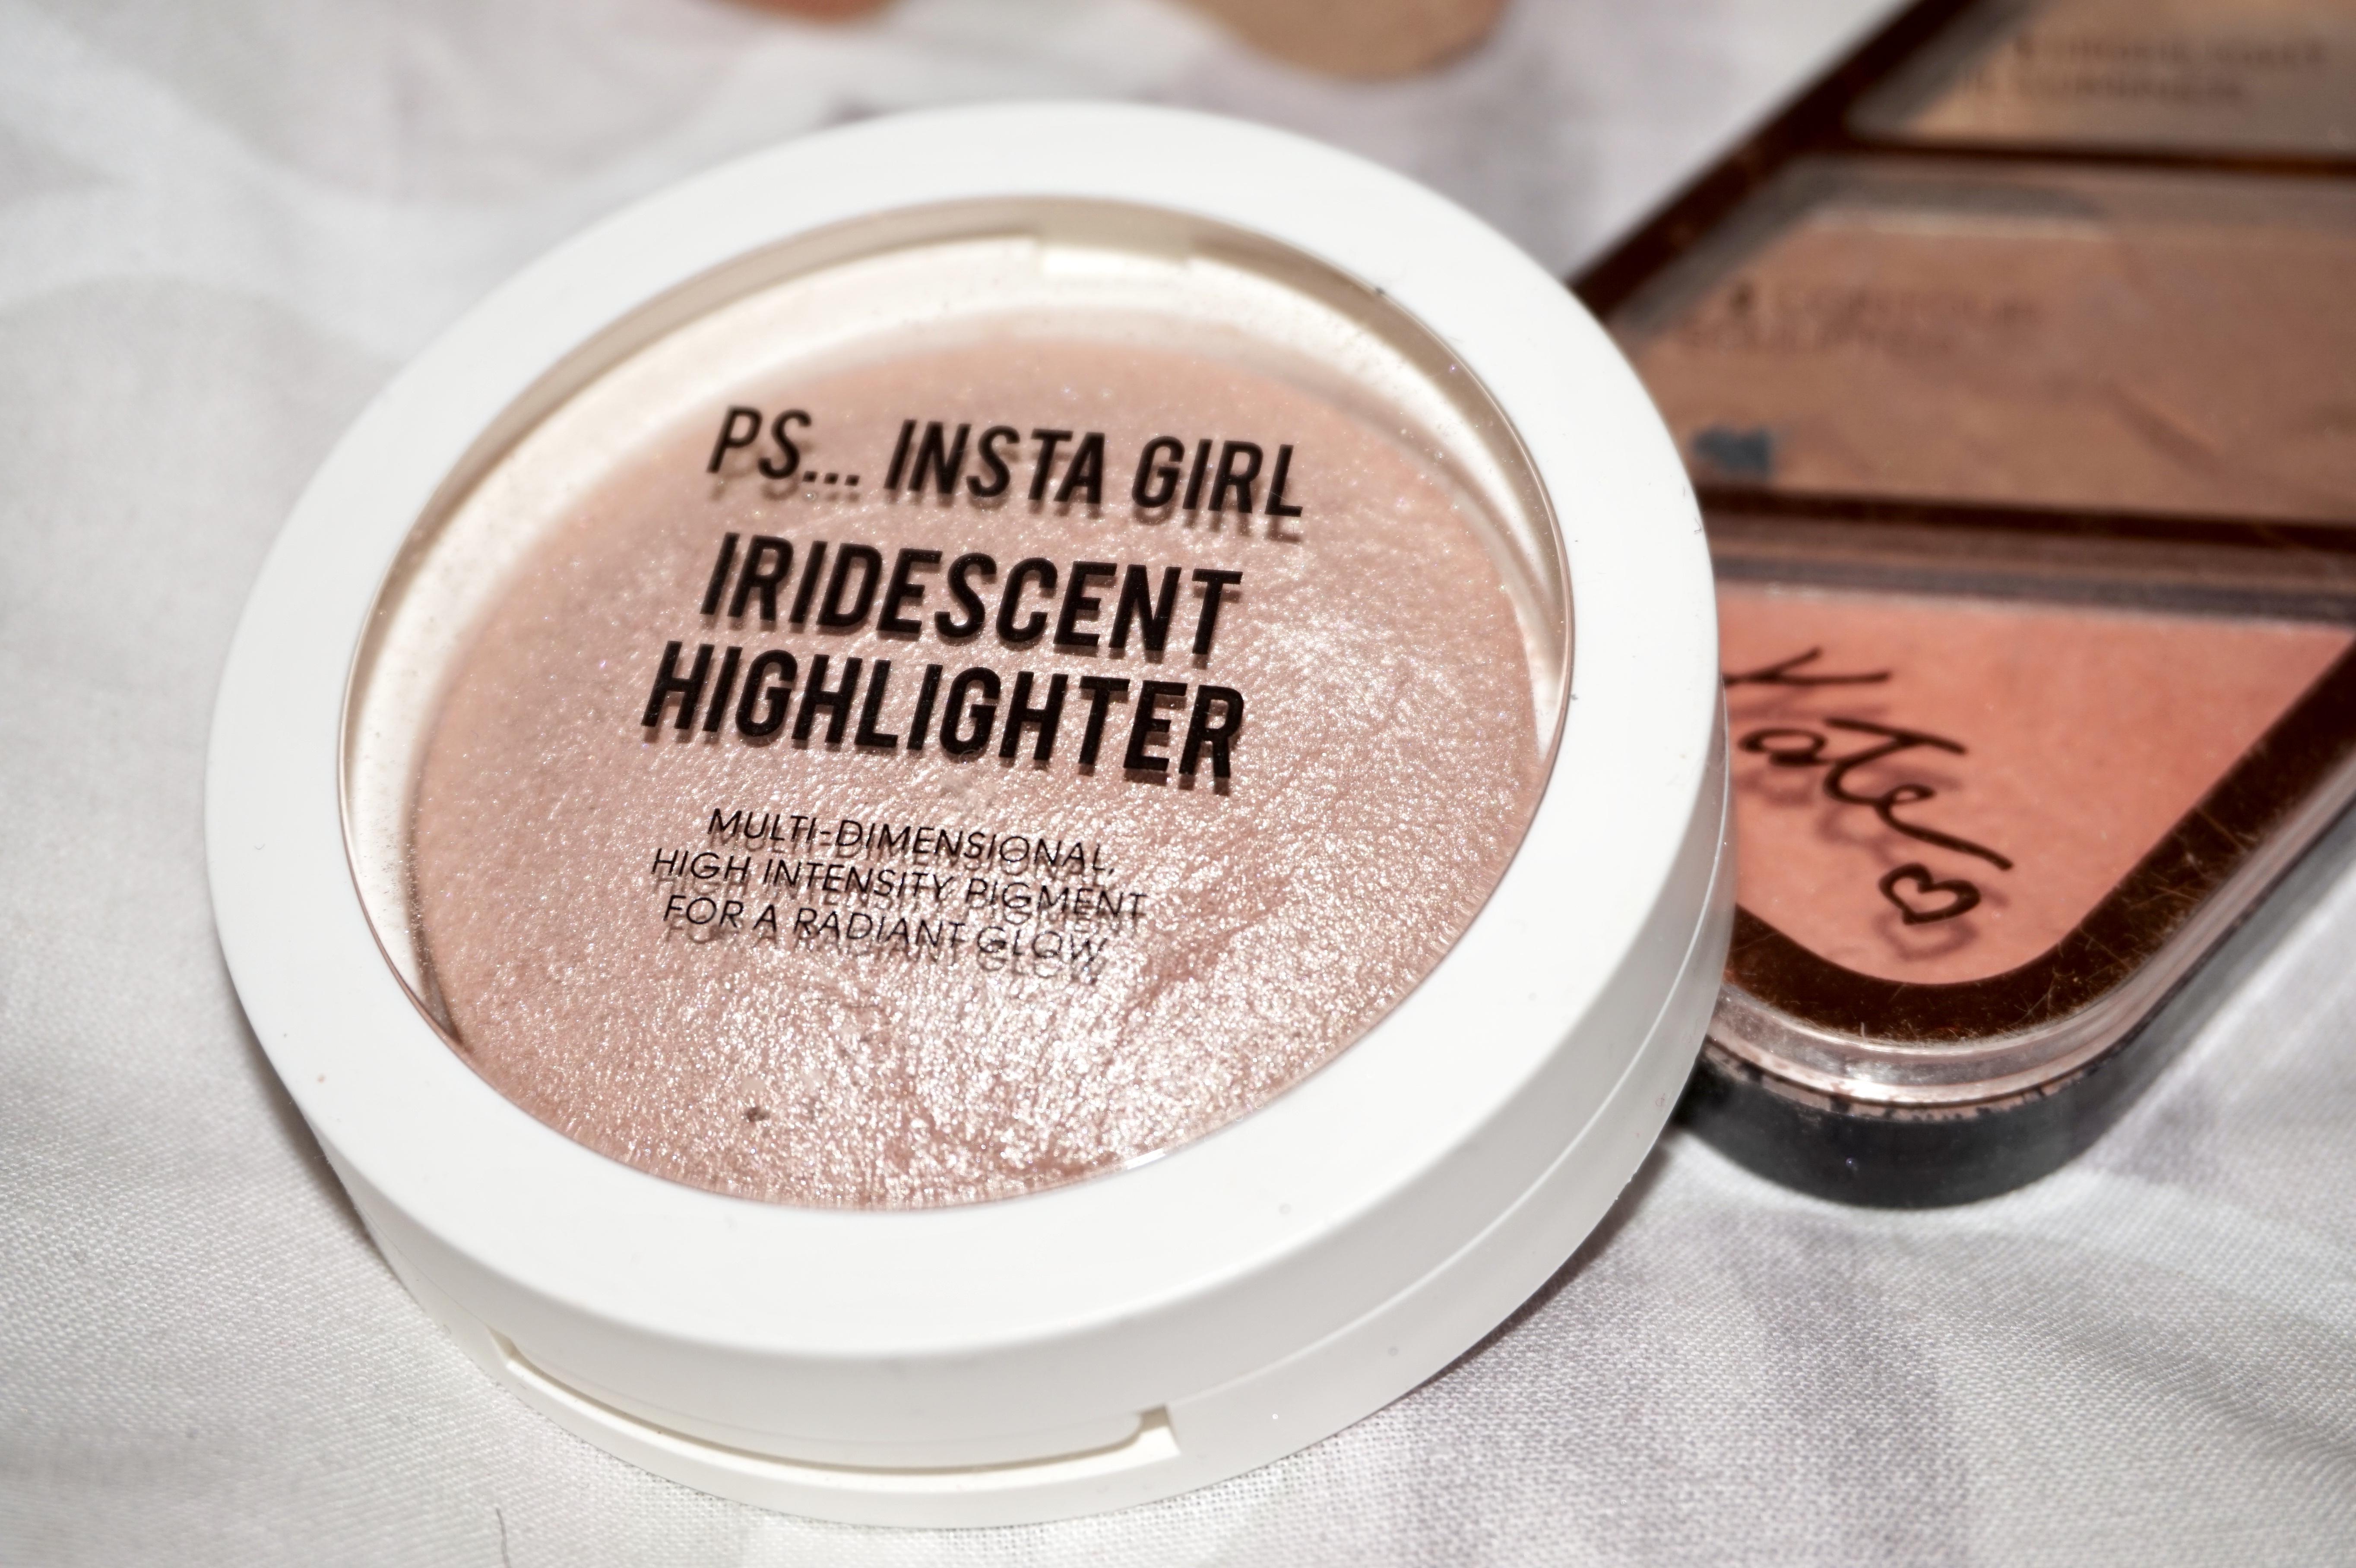 splash of glam make-up highlighter and blush